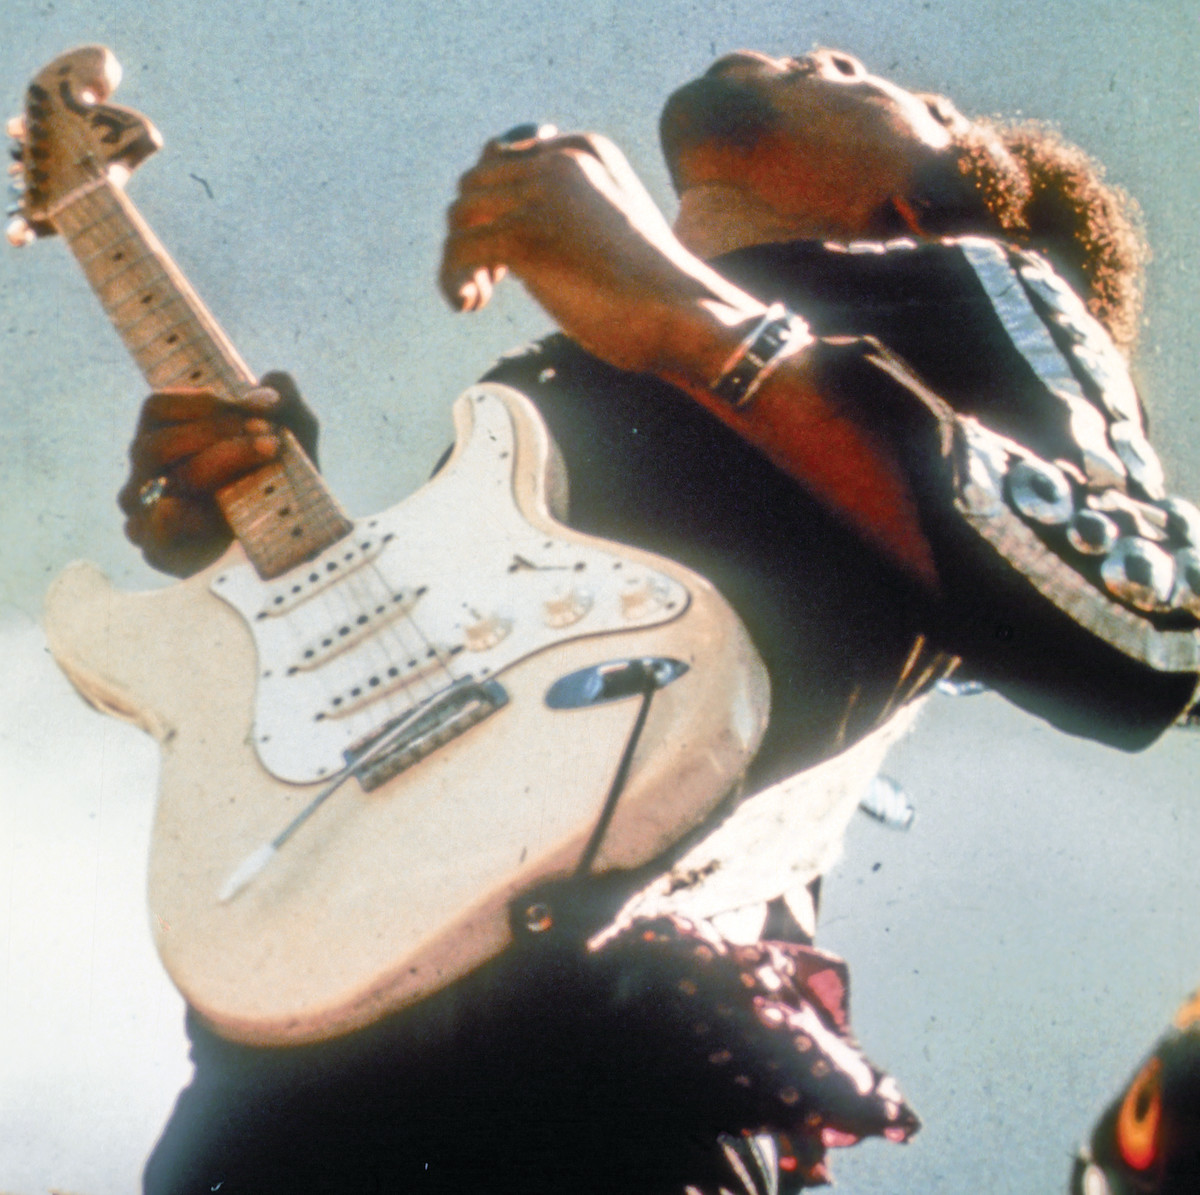 Photo by Daniel Teheney/Authentic Hendrix LLC